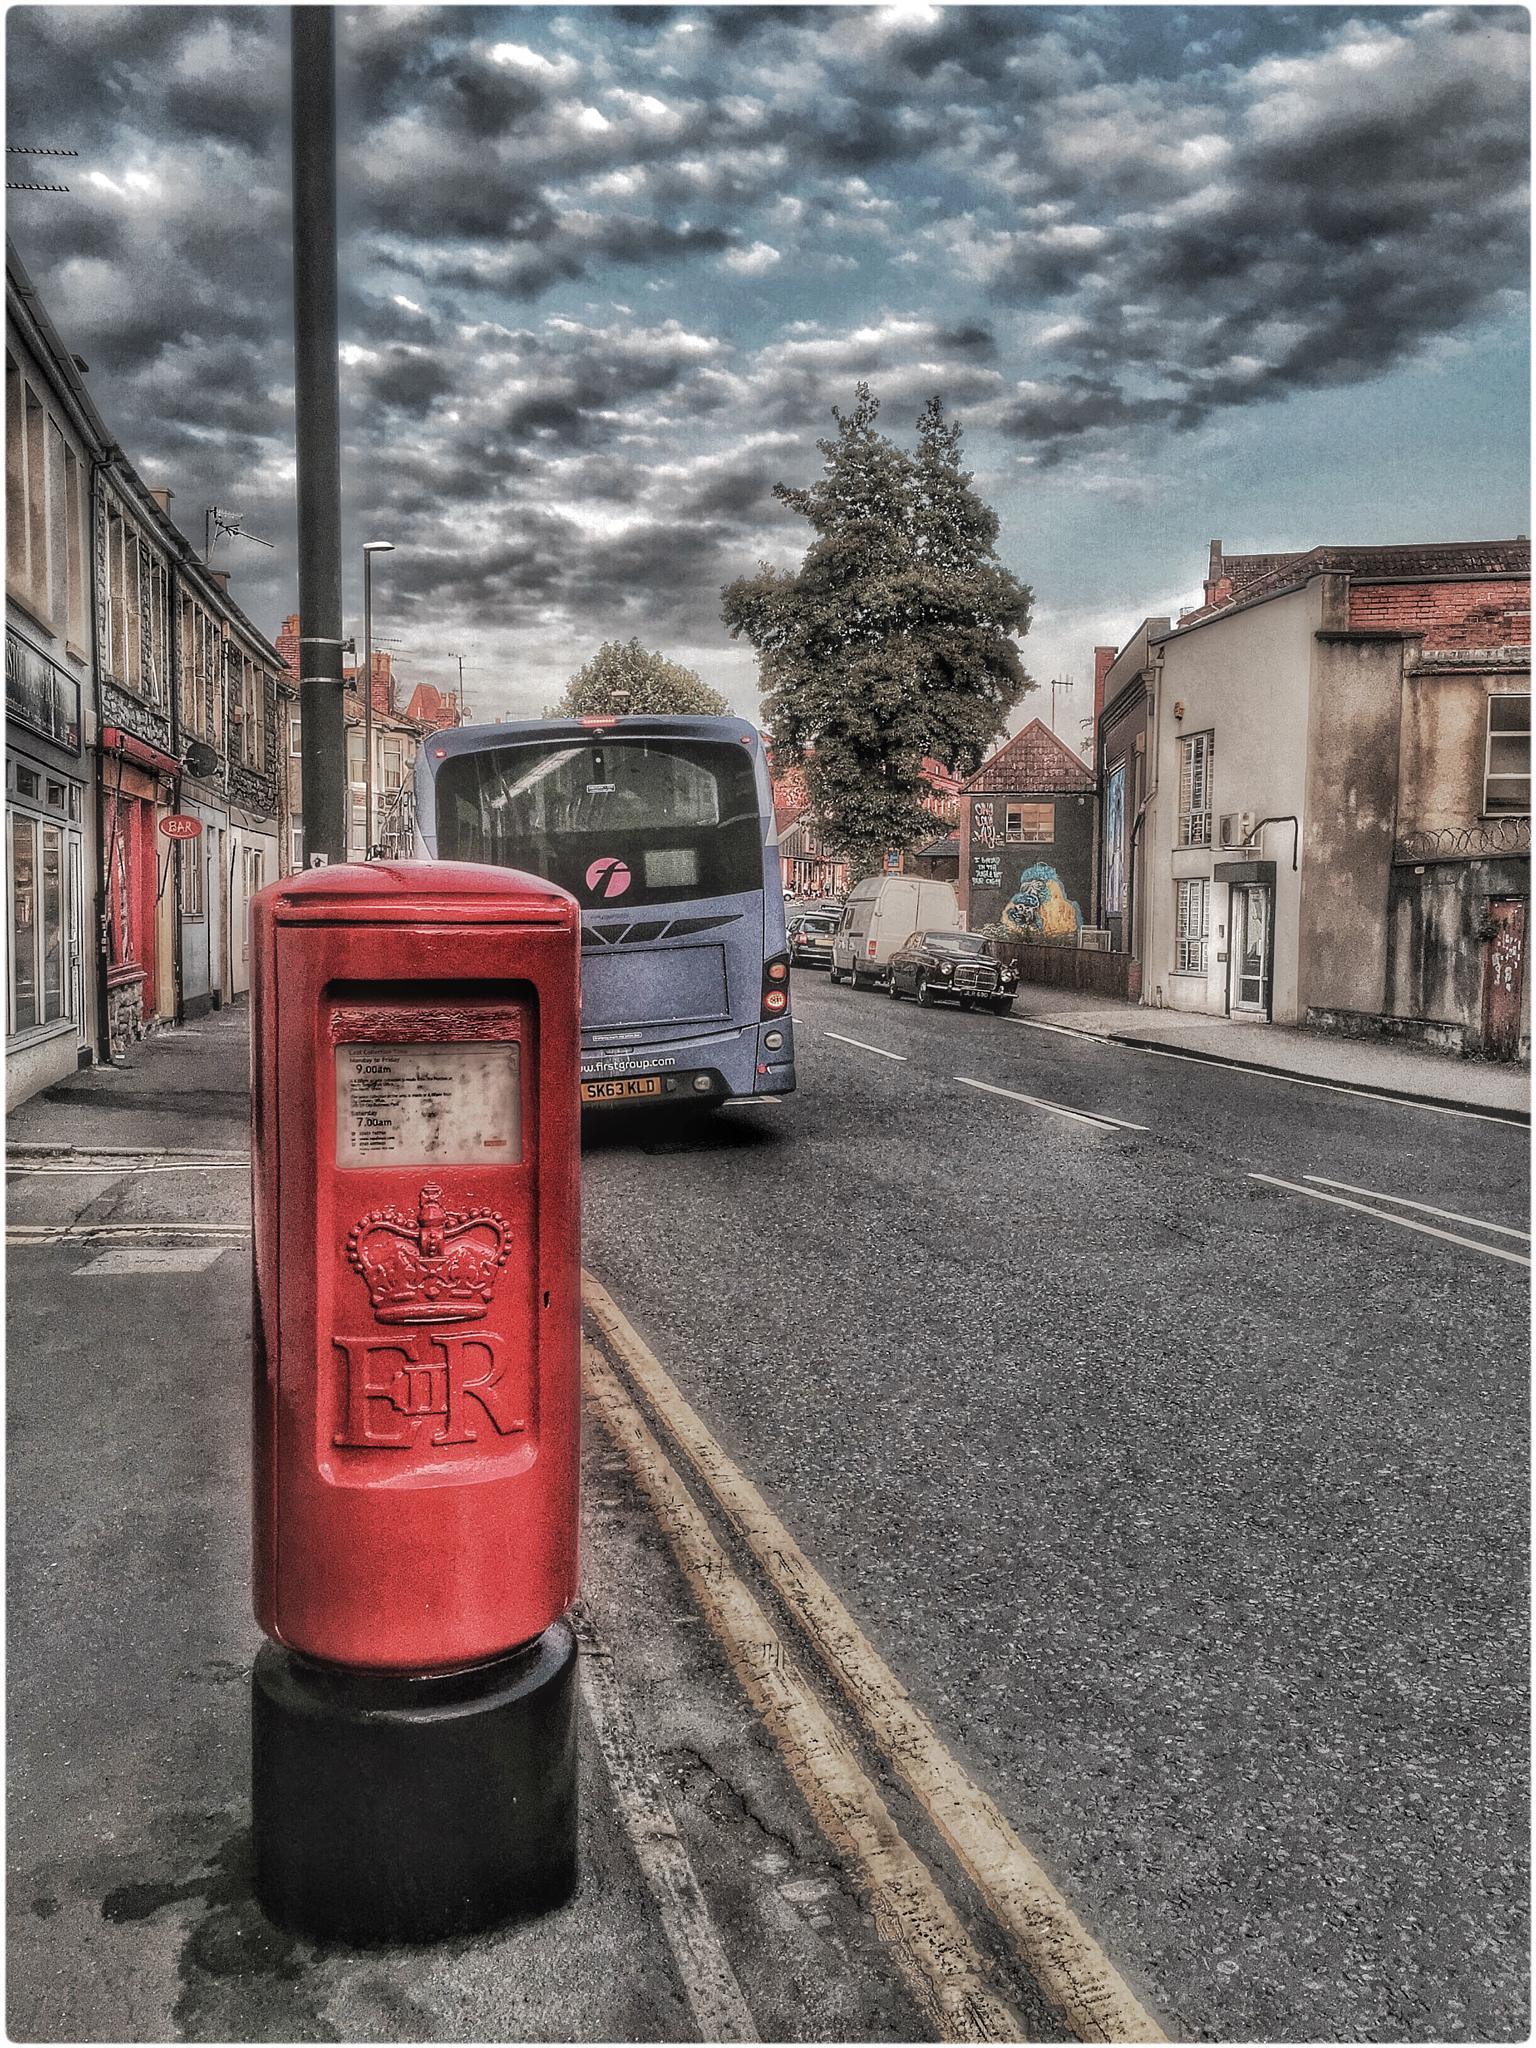 Letter box by John John McLane Freelance photographer